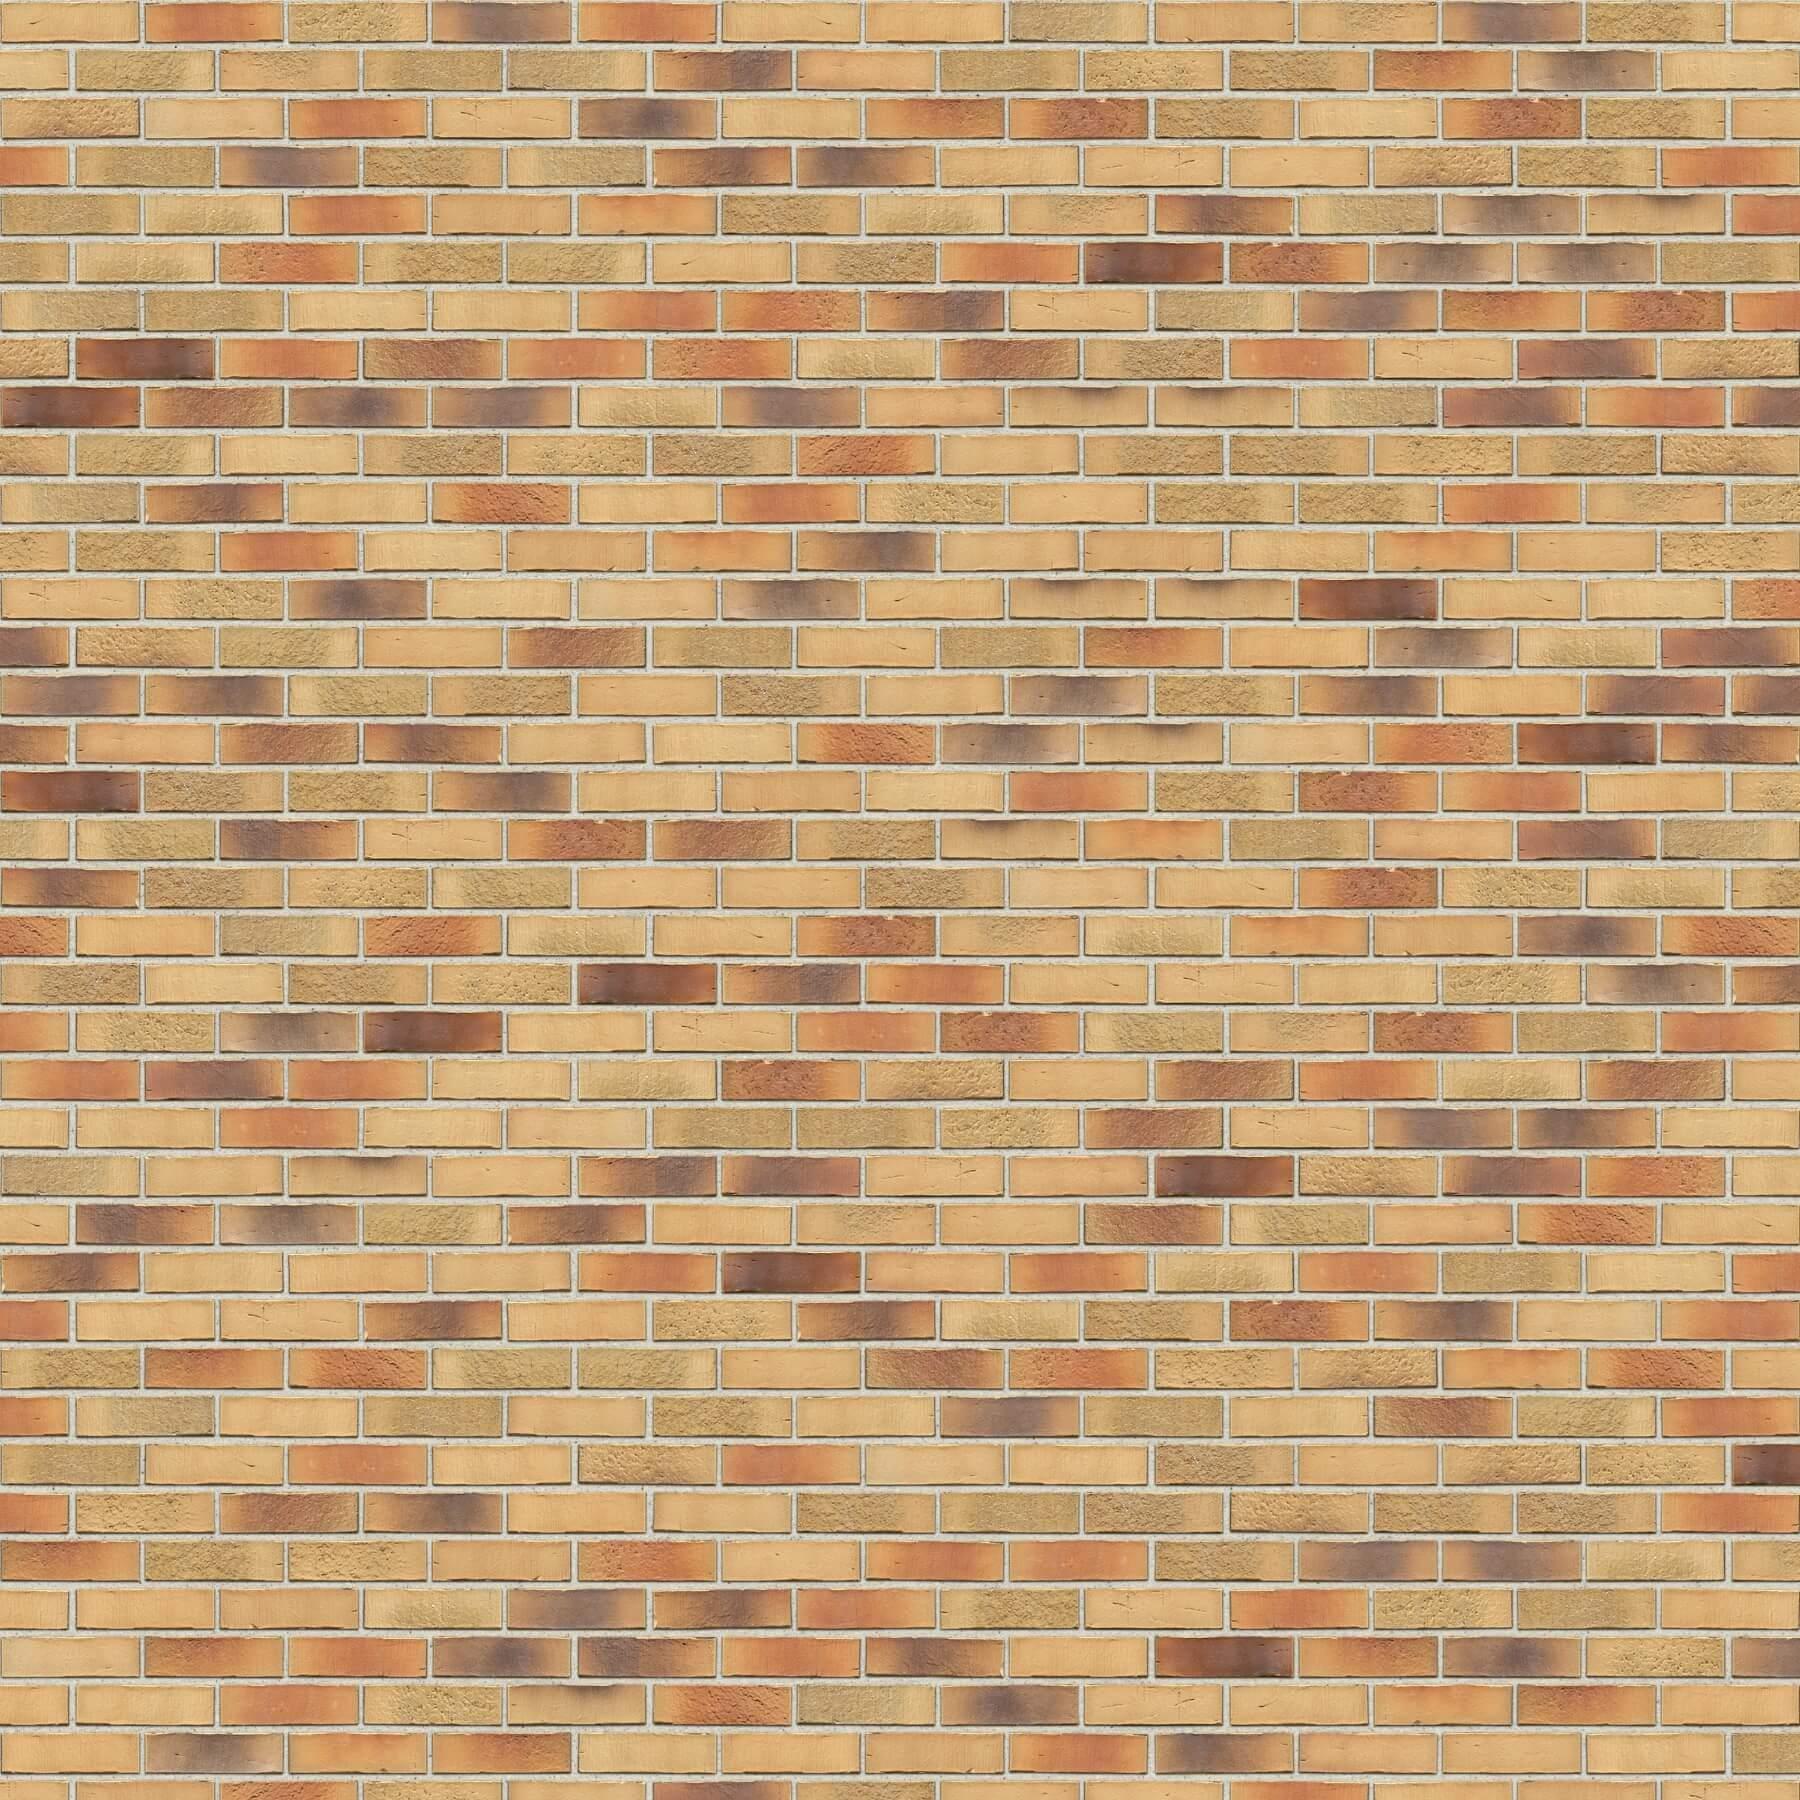 Puna-cigla-FeldHaus-Klinker-brick-house-beograd-nf-k-915-Bela Fuga